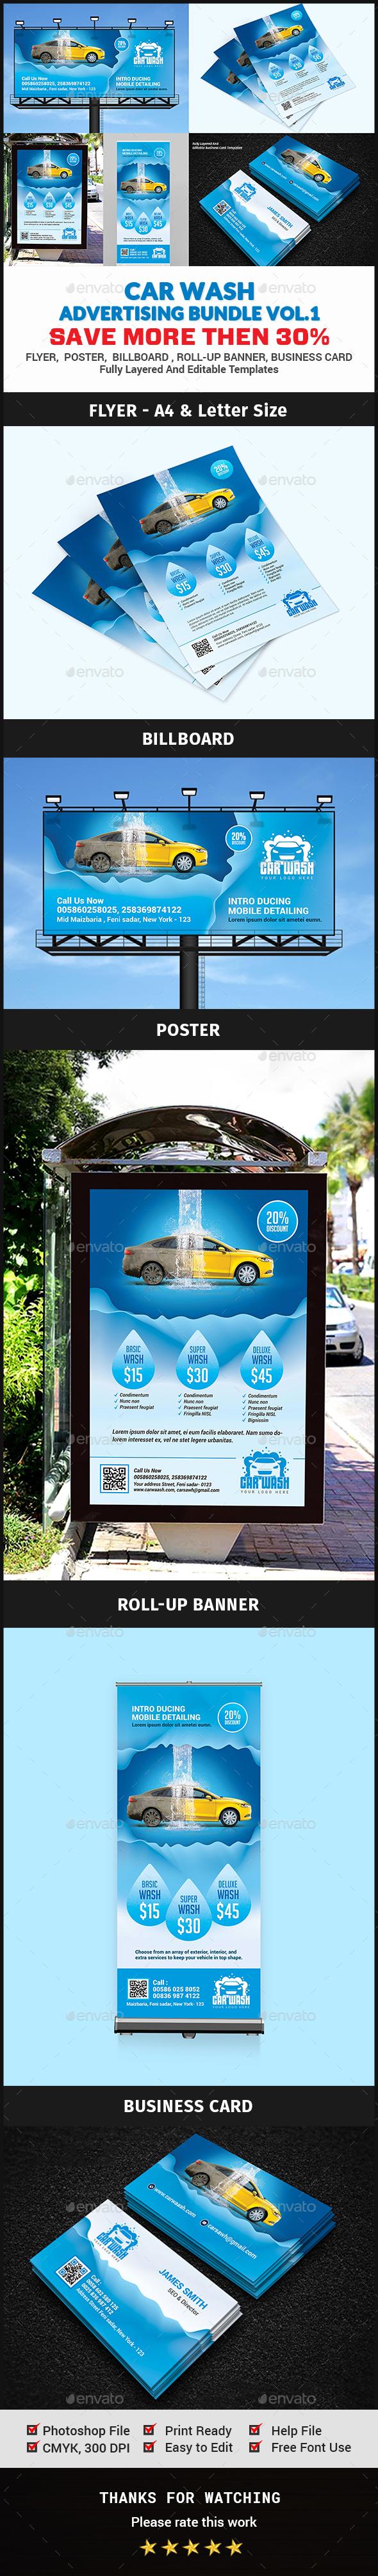 Car Wash Advertising Bundle Vol.1 - Signage Print Templates